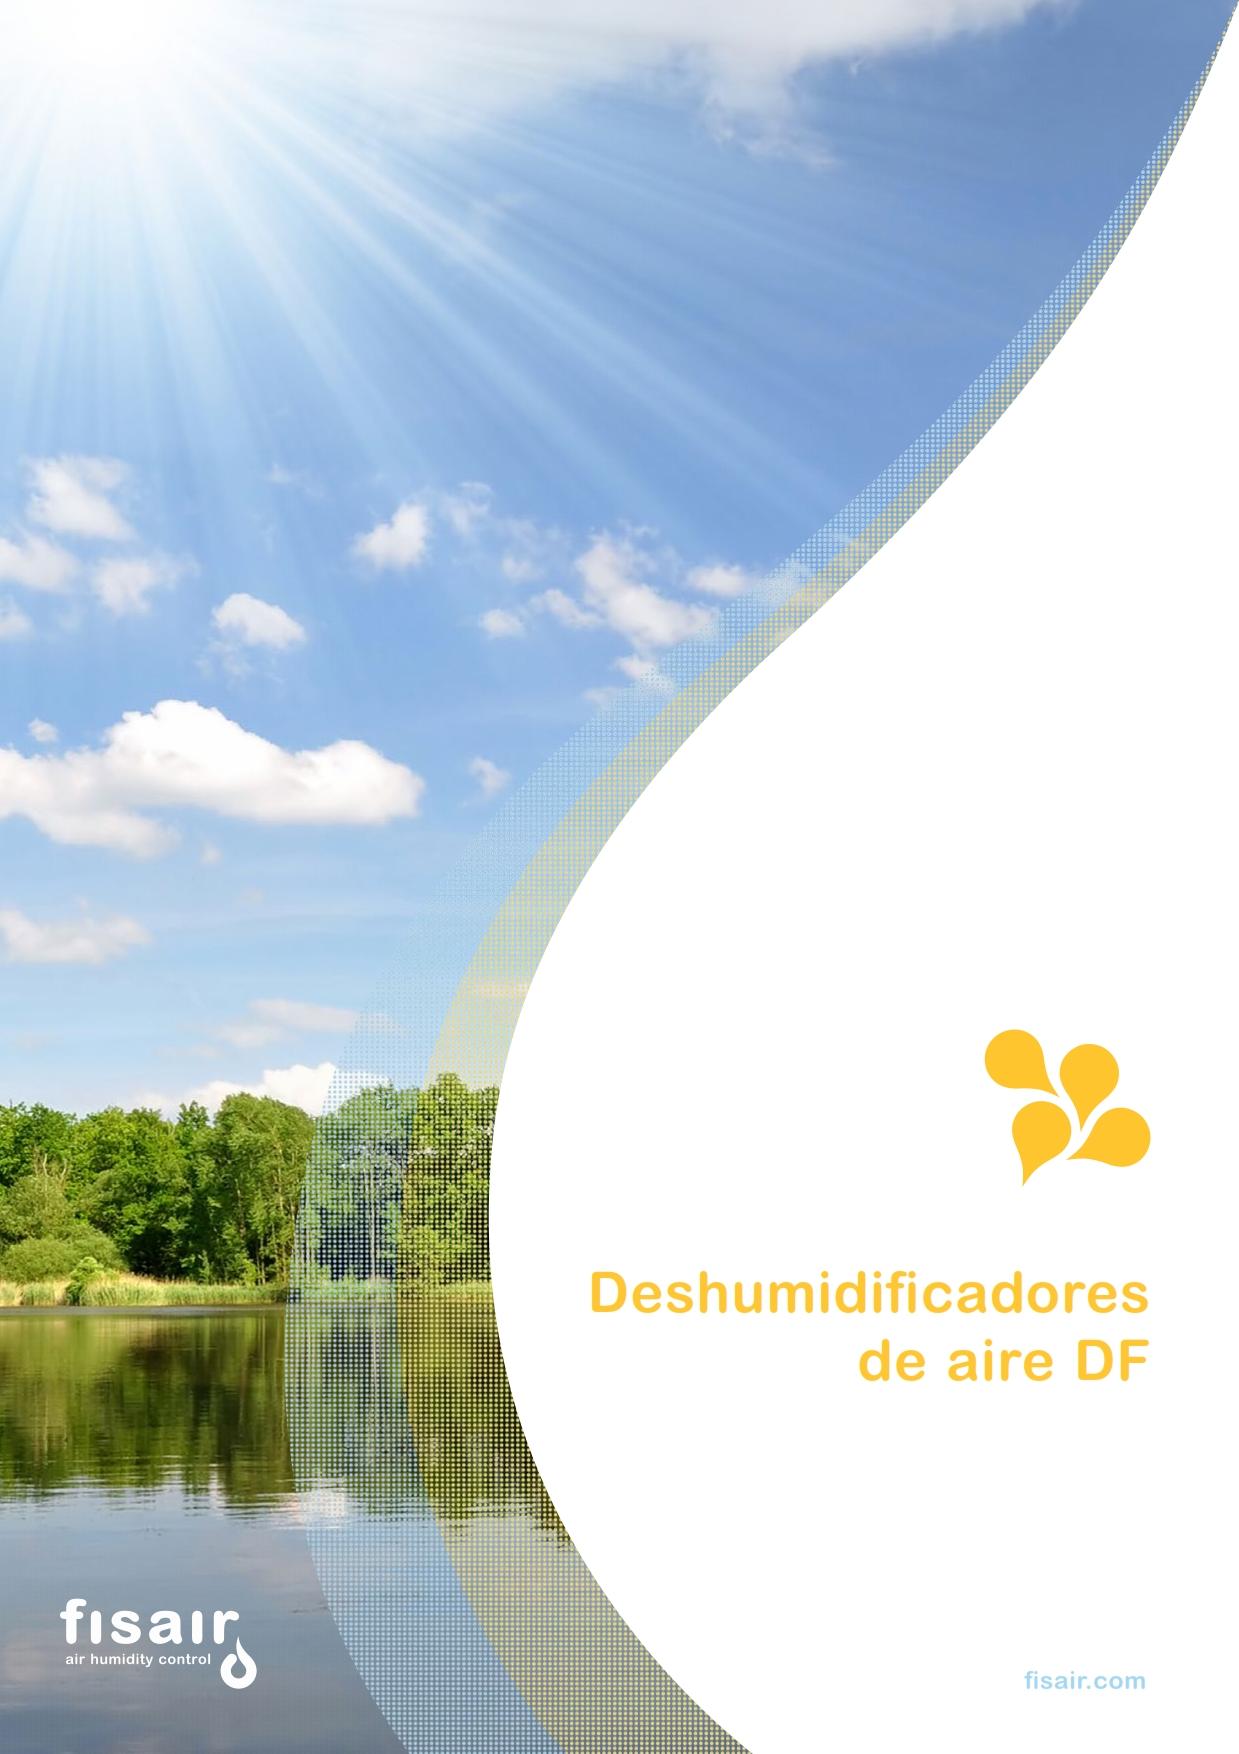 Deshumidificadores de aire DF | Fisair | Air Dehumidifiers